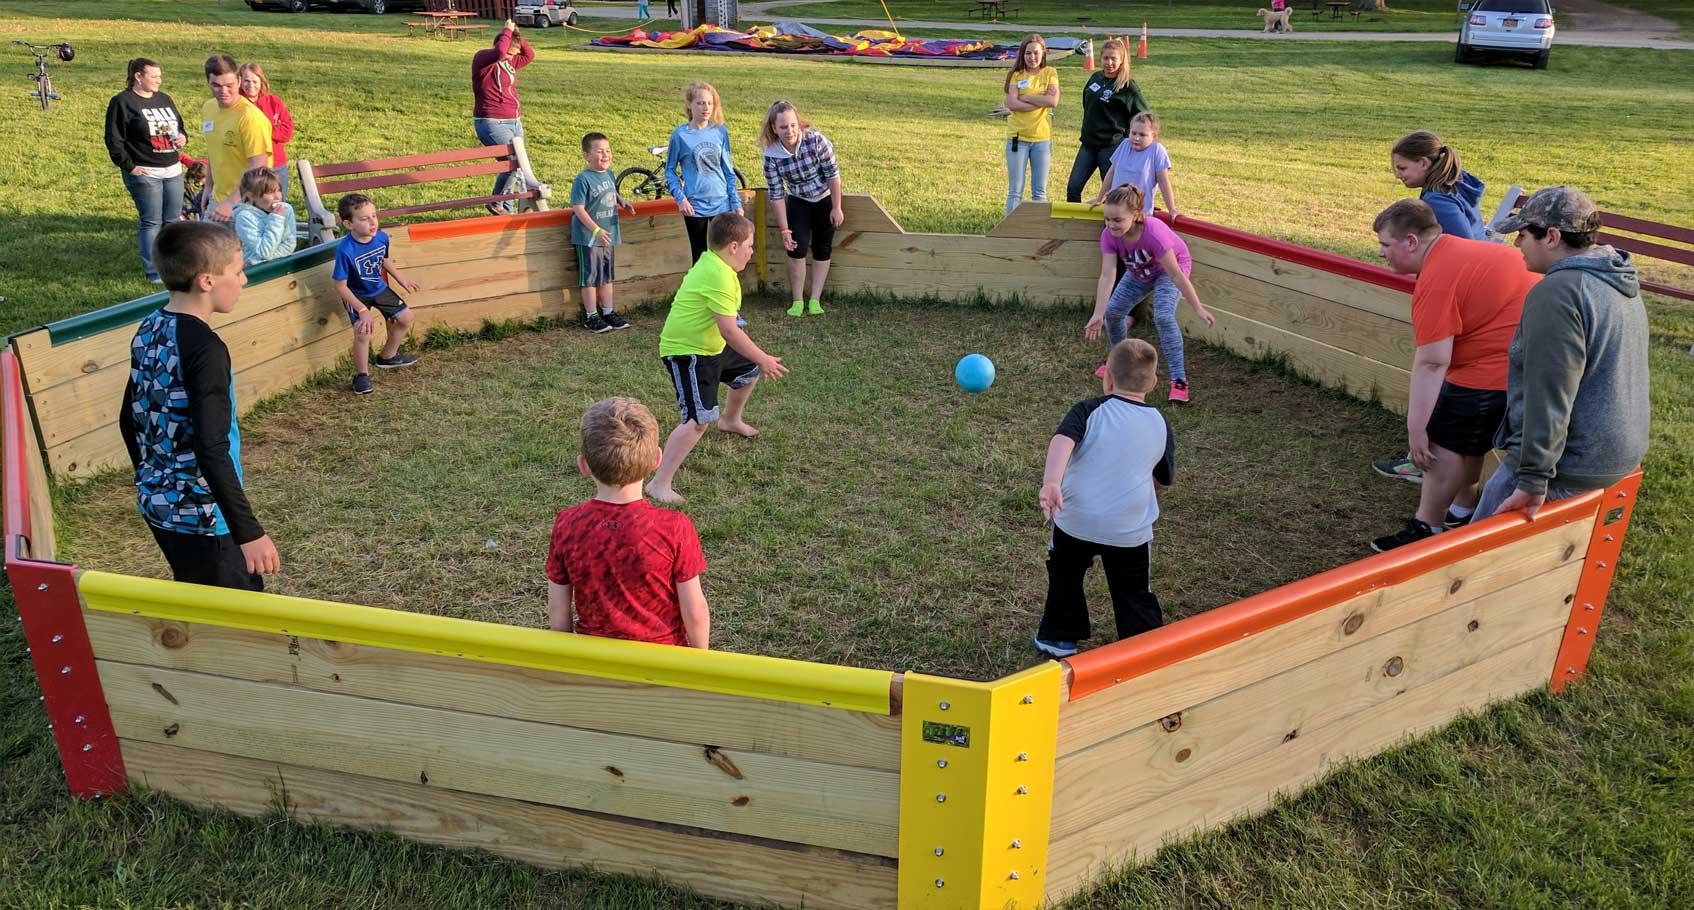 group of children playing gaga ball